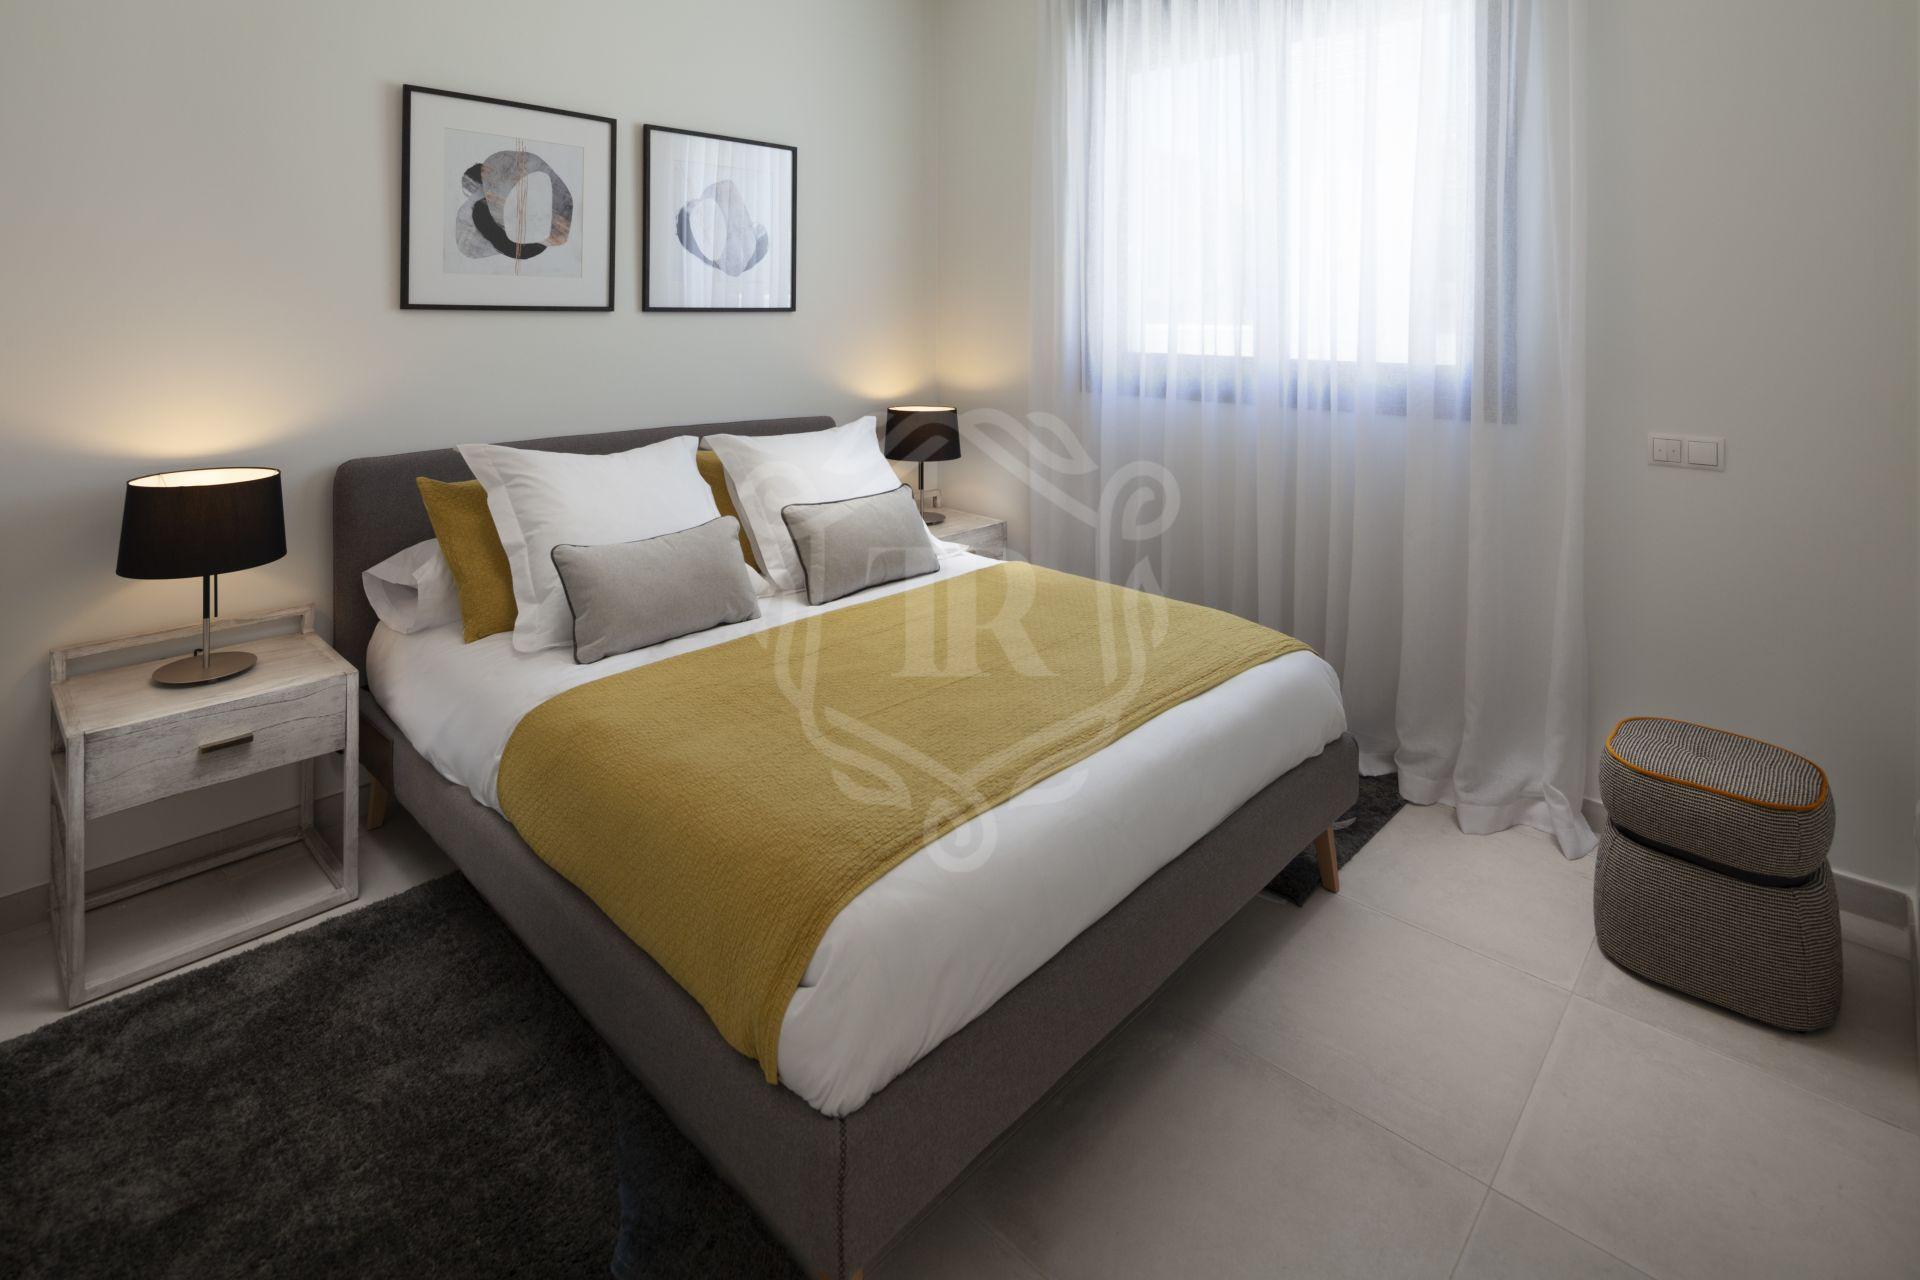 Penthouse for sale in Cortijo del Golf, Estepona